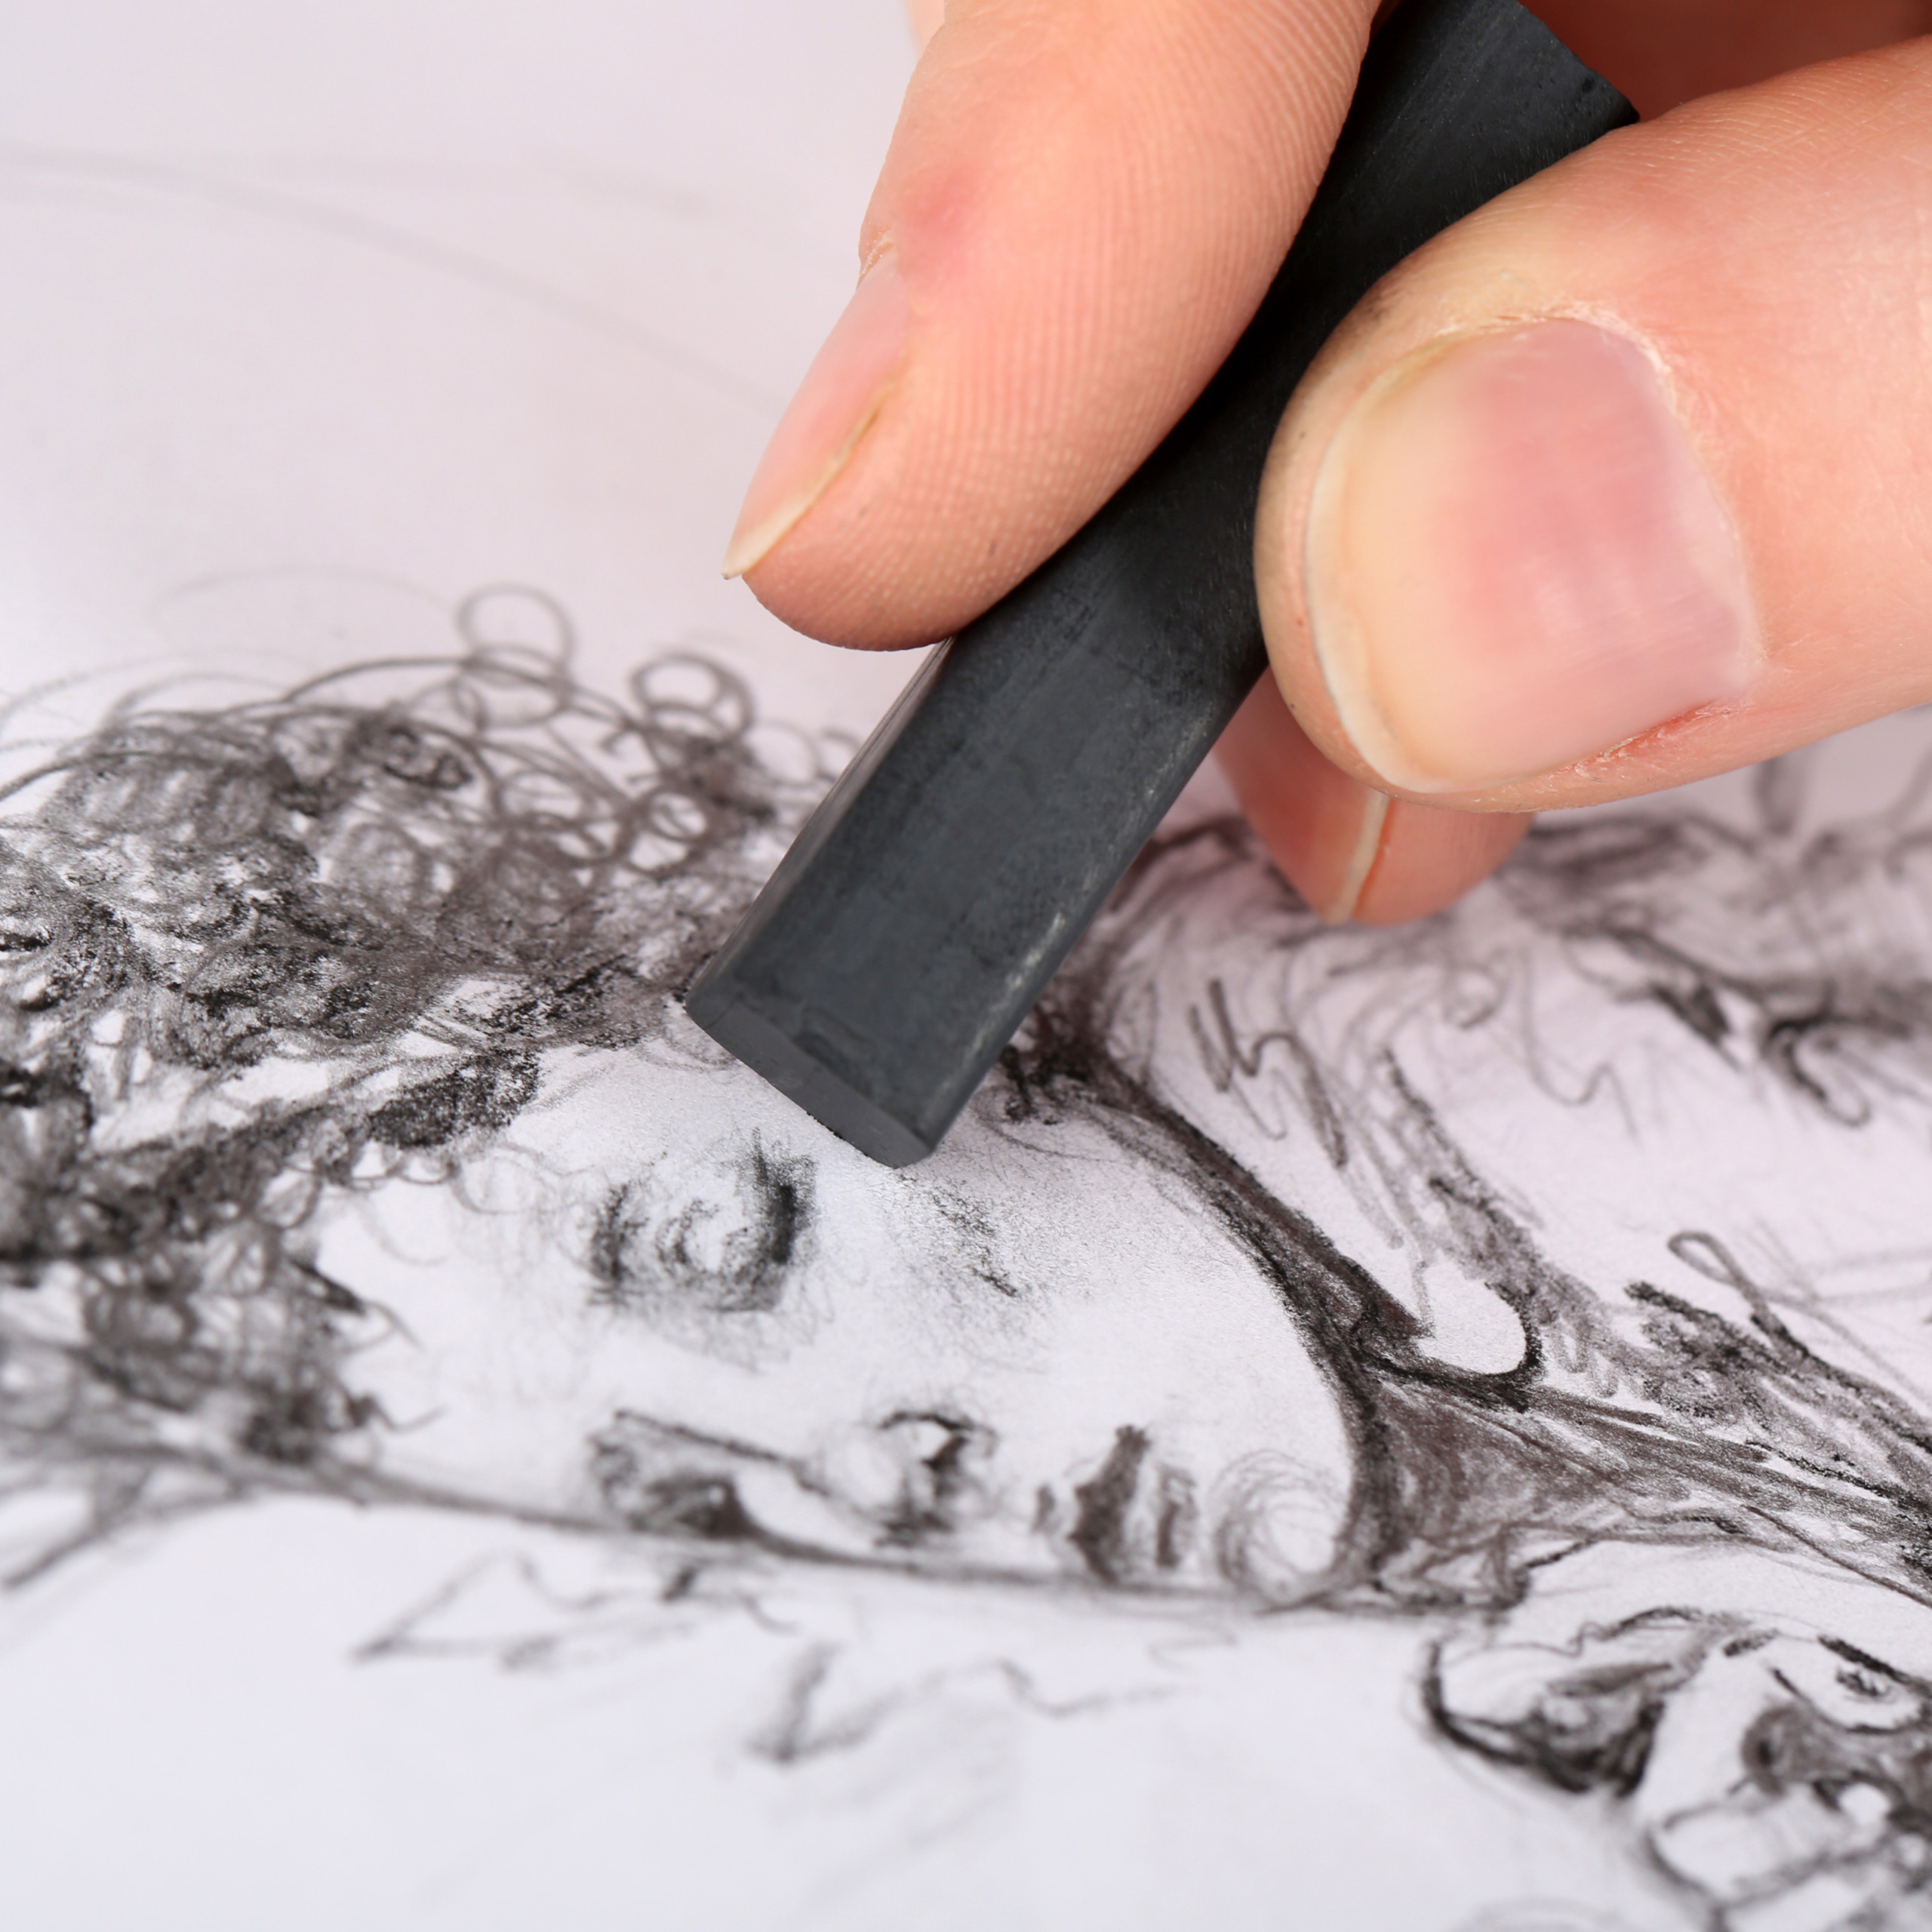 tekenset-hout-tekenkoffer-tekenspullen-tekendoos-48-delig miniatuur 5